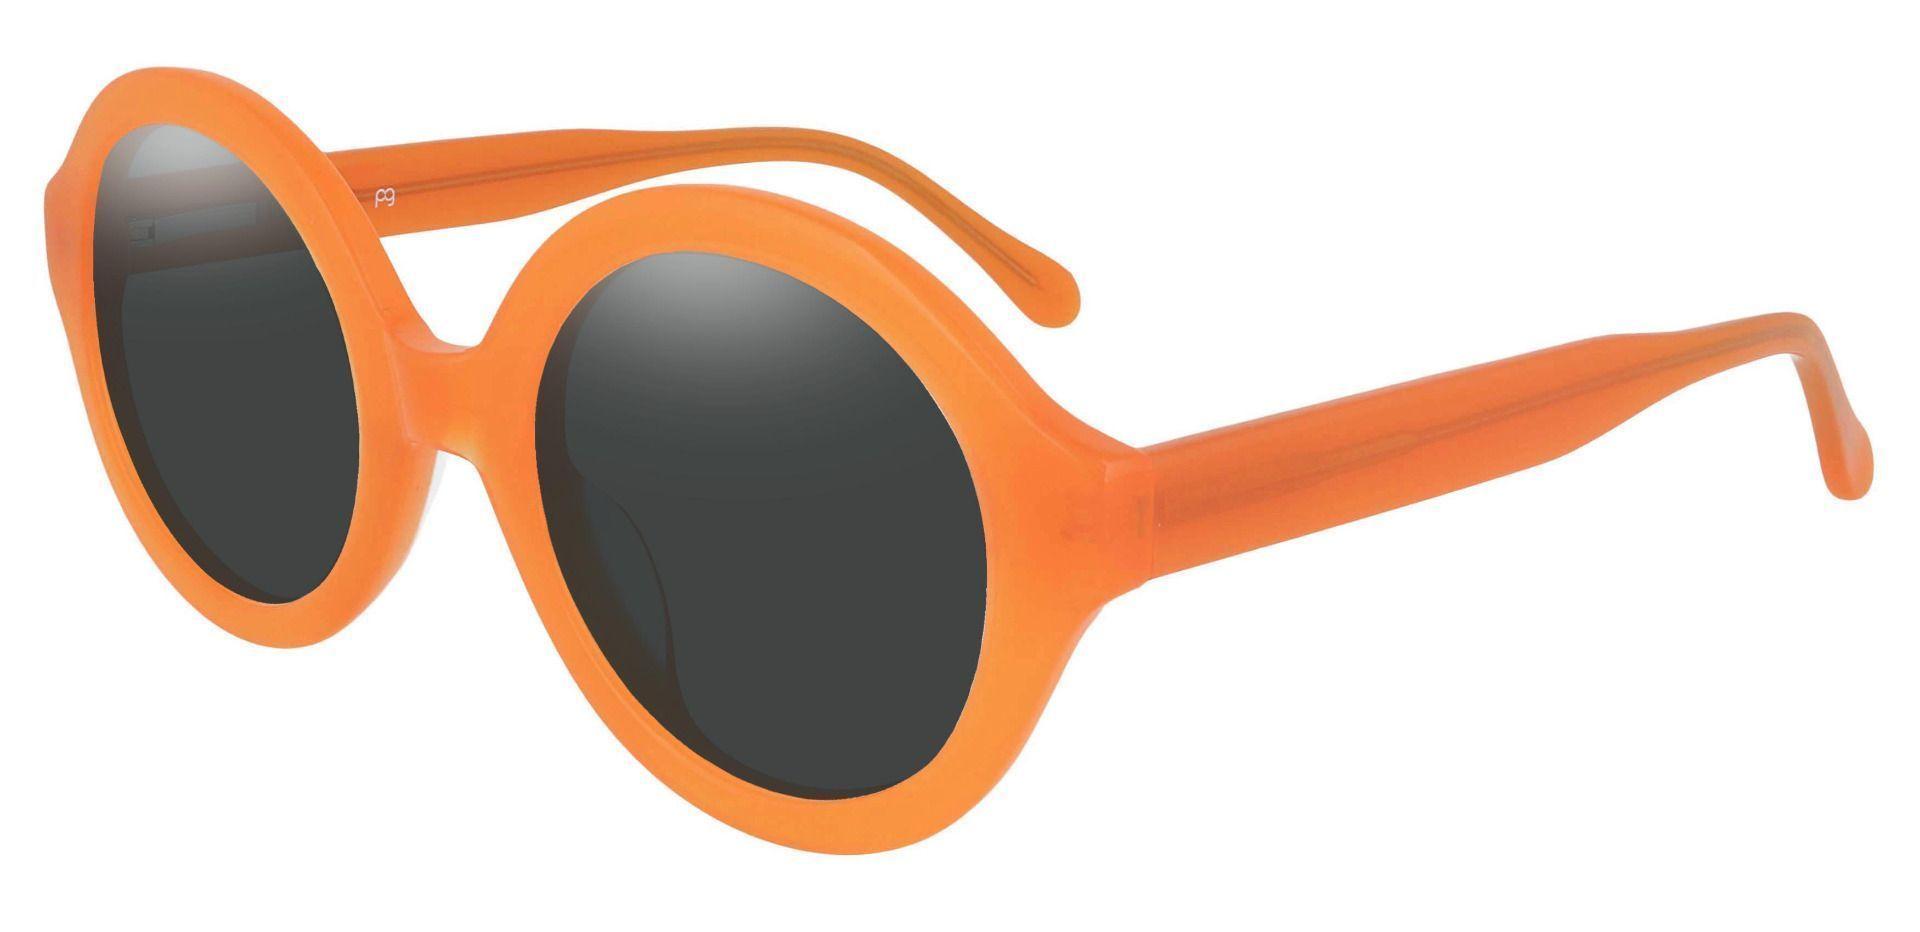 Clara Round Prescription Sunglasses - Orange Frame With Gray Lenses